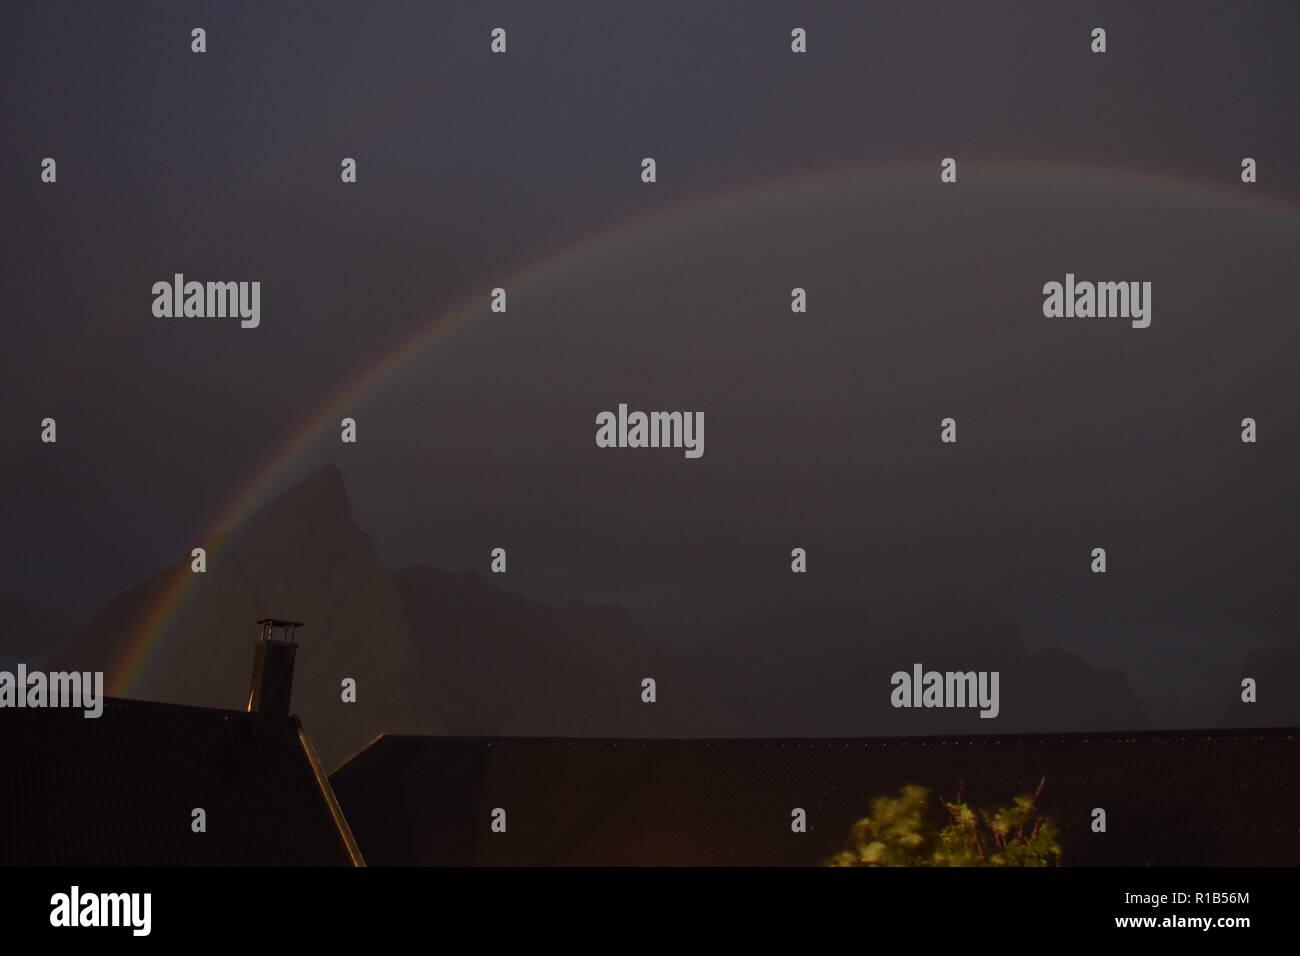 Mondregenbogen, Regenbogen, Norwegen, Reine, Lofoten, Nacht, Vollmond, Himmel, Doppelregenbogen, Regenbogenfarben, grün, rot, gelb, blau, violett - Stock Image